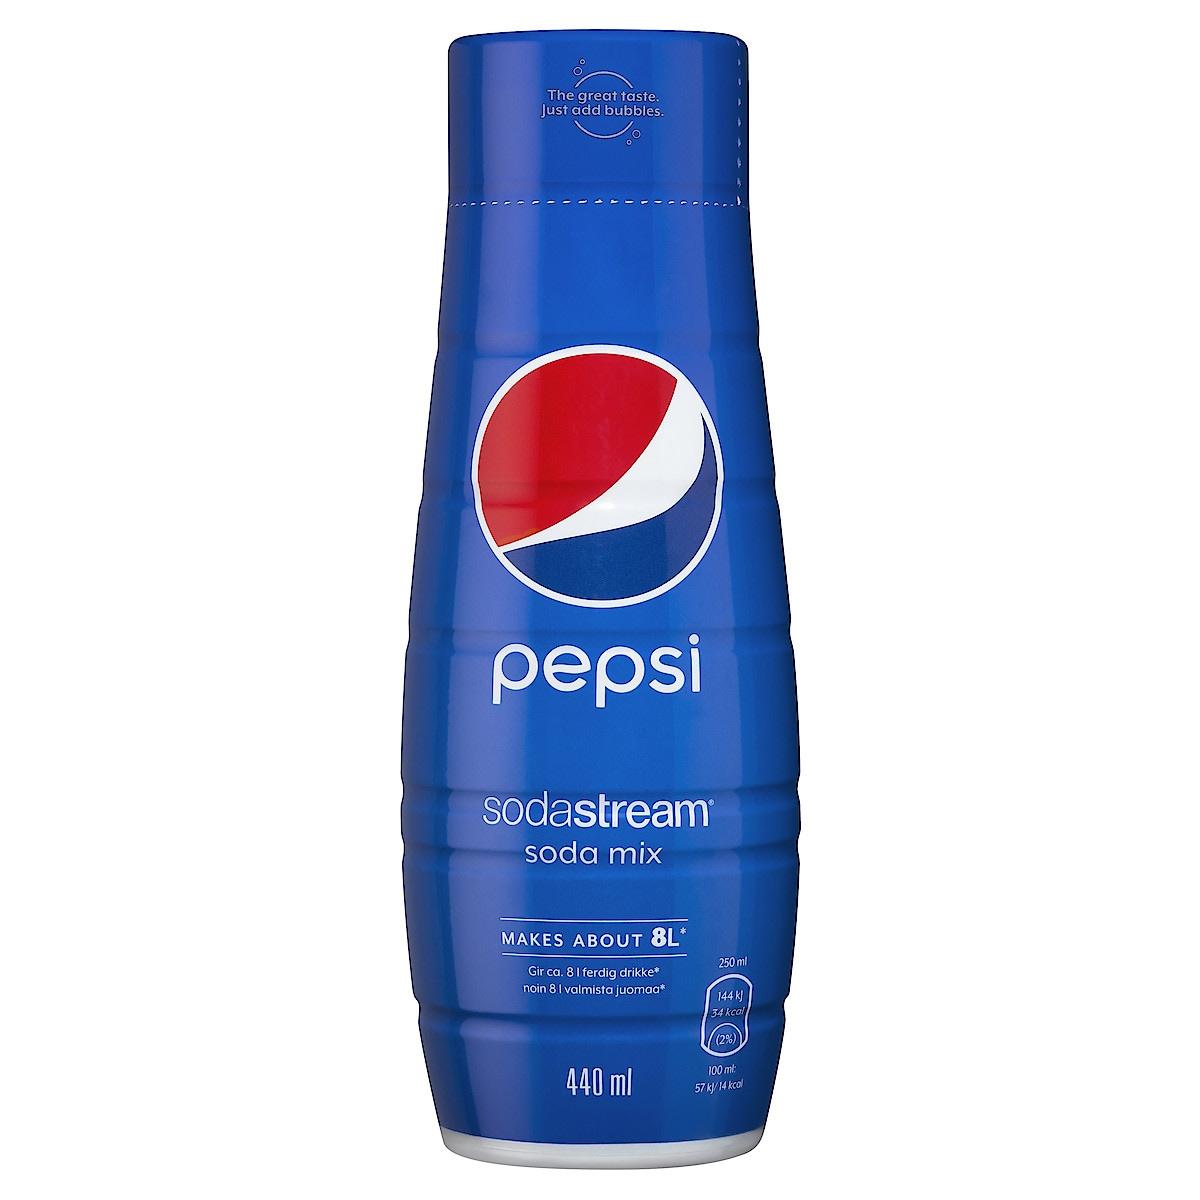 SodaStream Pepsi, smakkoncentrat 440 ml